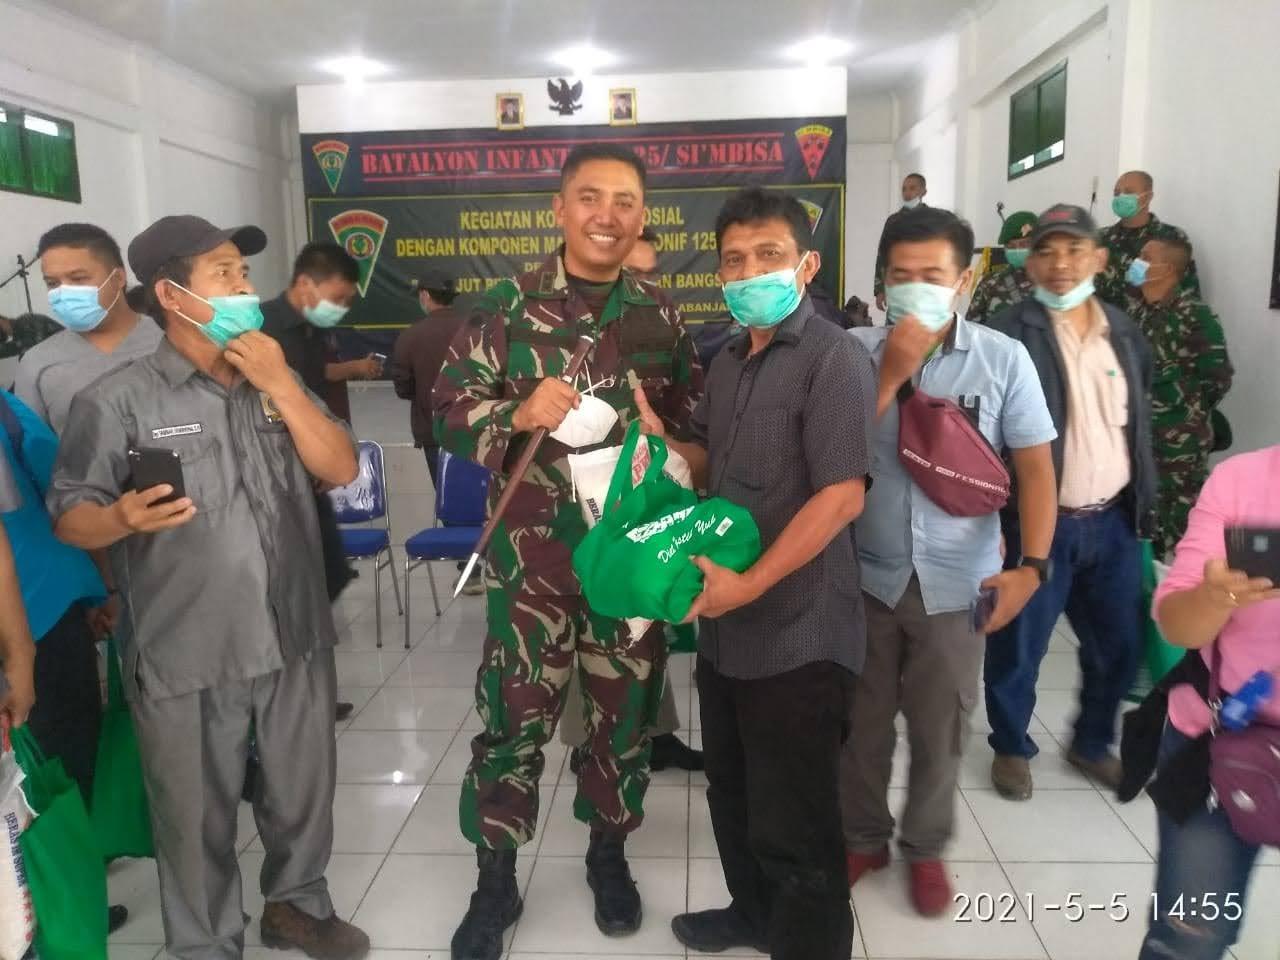 Batalyon Infanteri 125/SMB Gelar Komsos Bersama Insan Pers